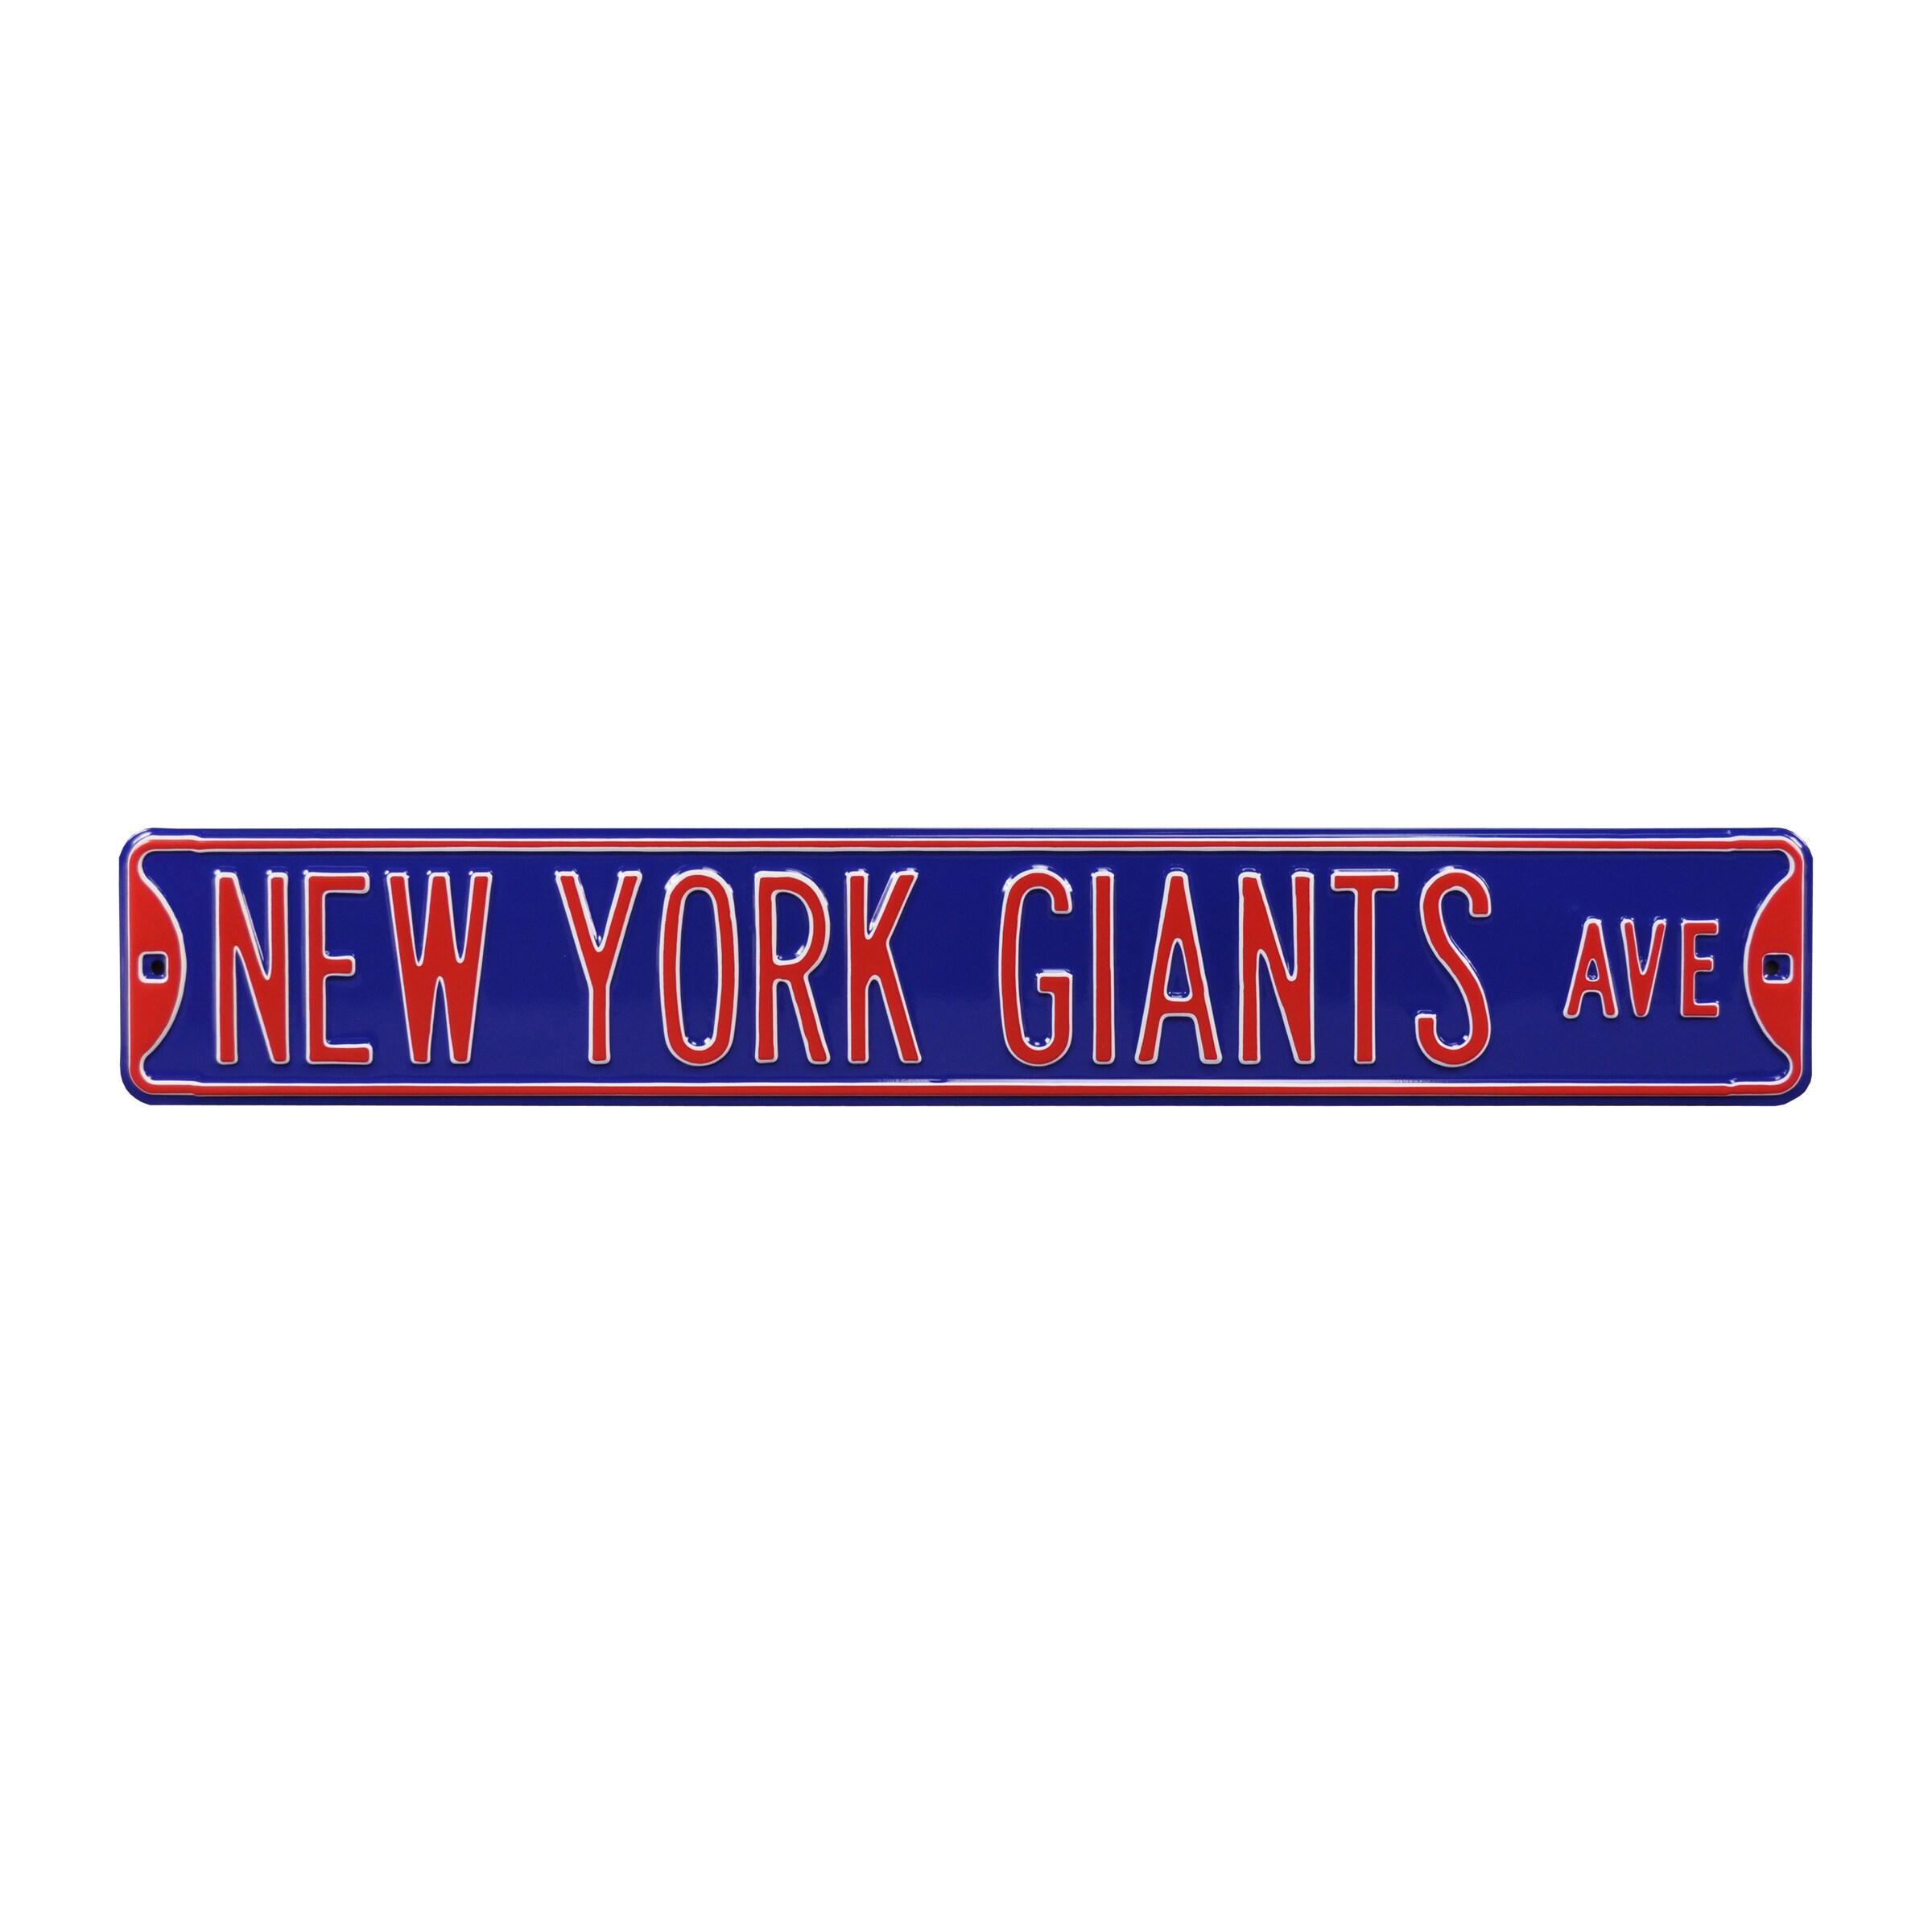 "New York Giants Ave 6"" x 36"" Steel Street Sign - Royal"